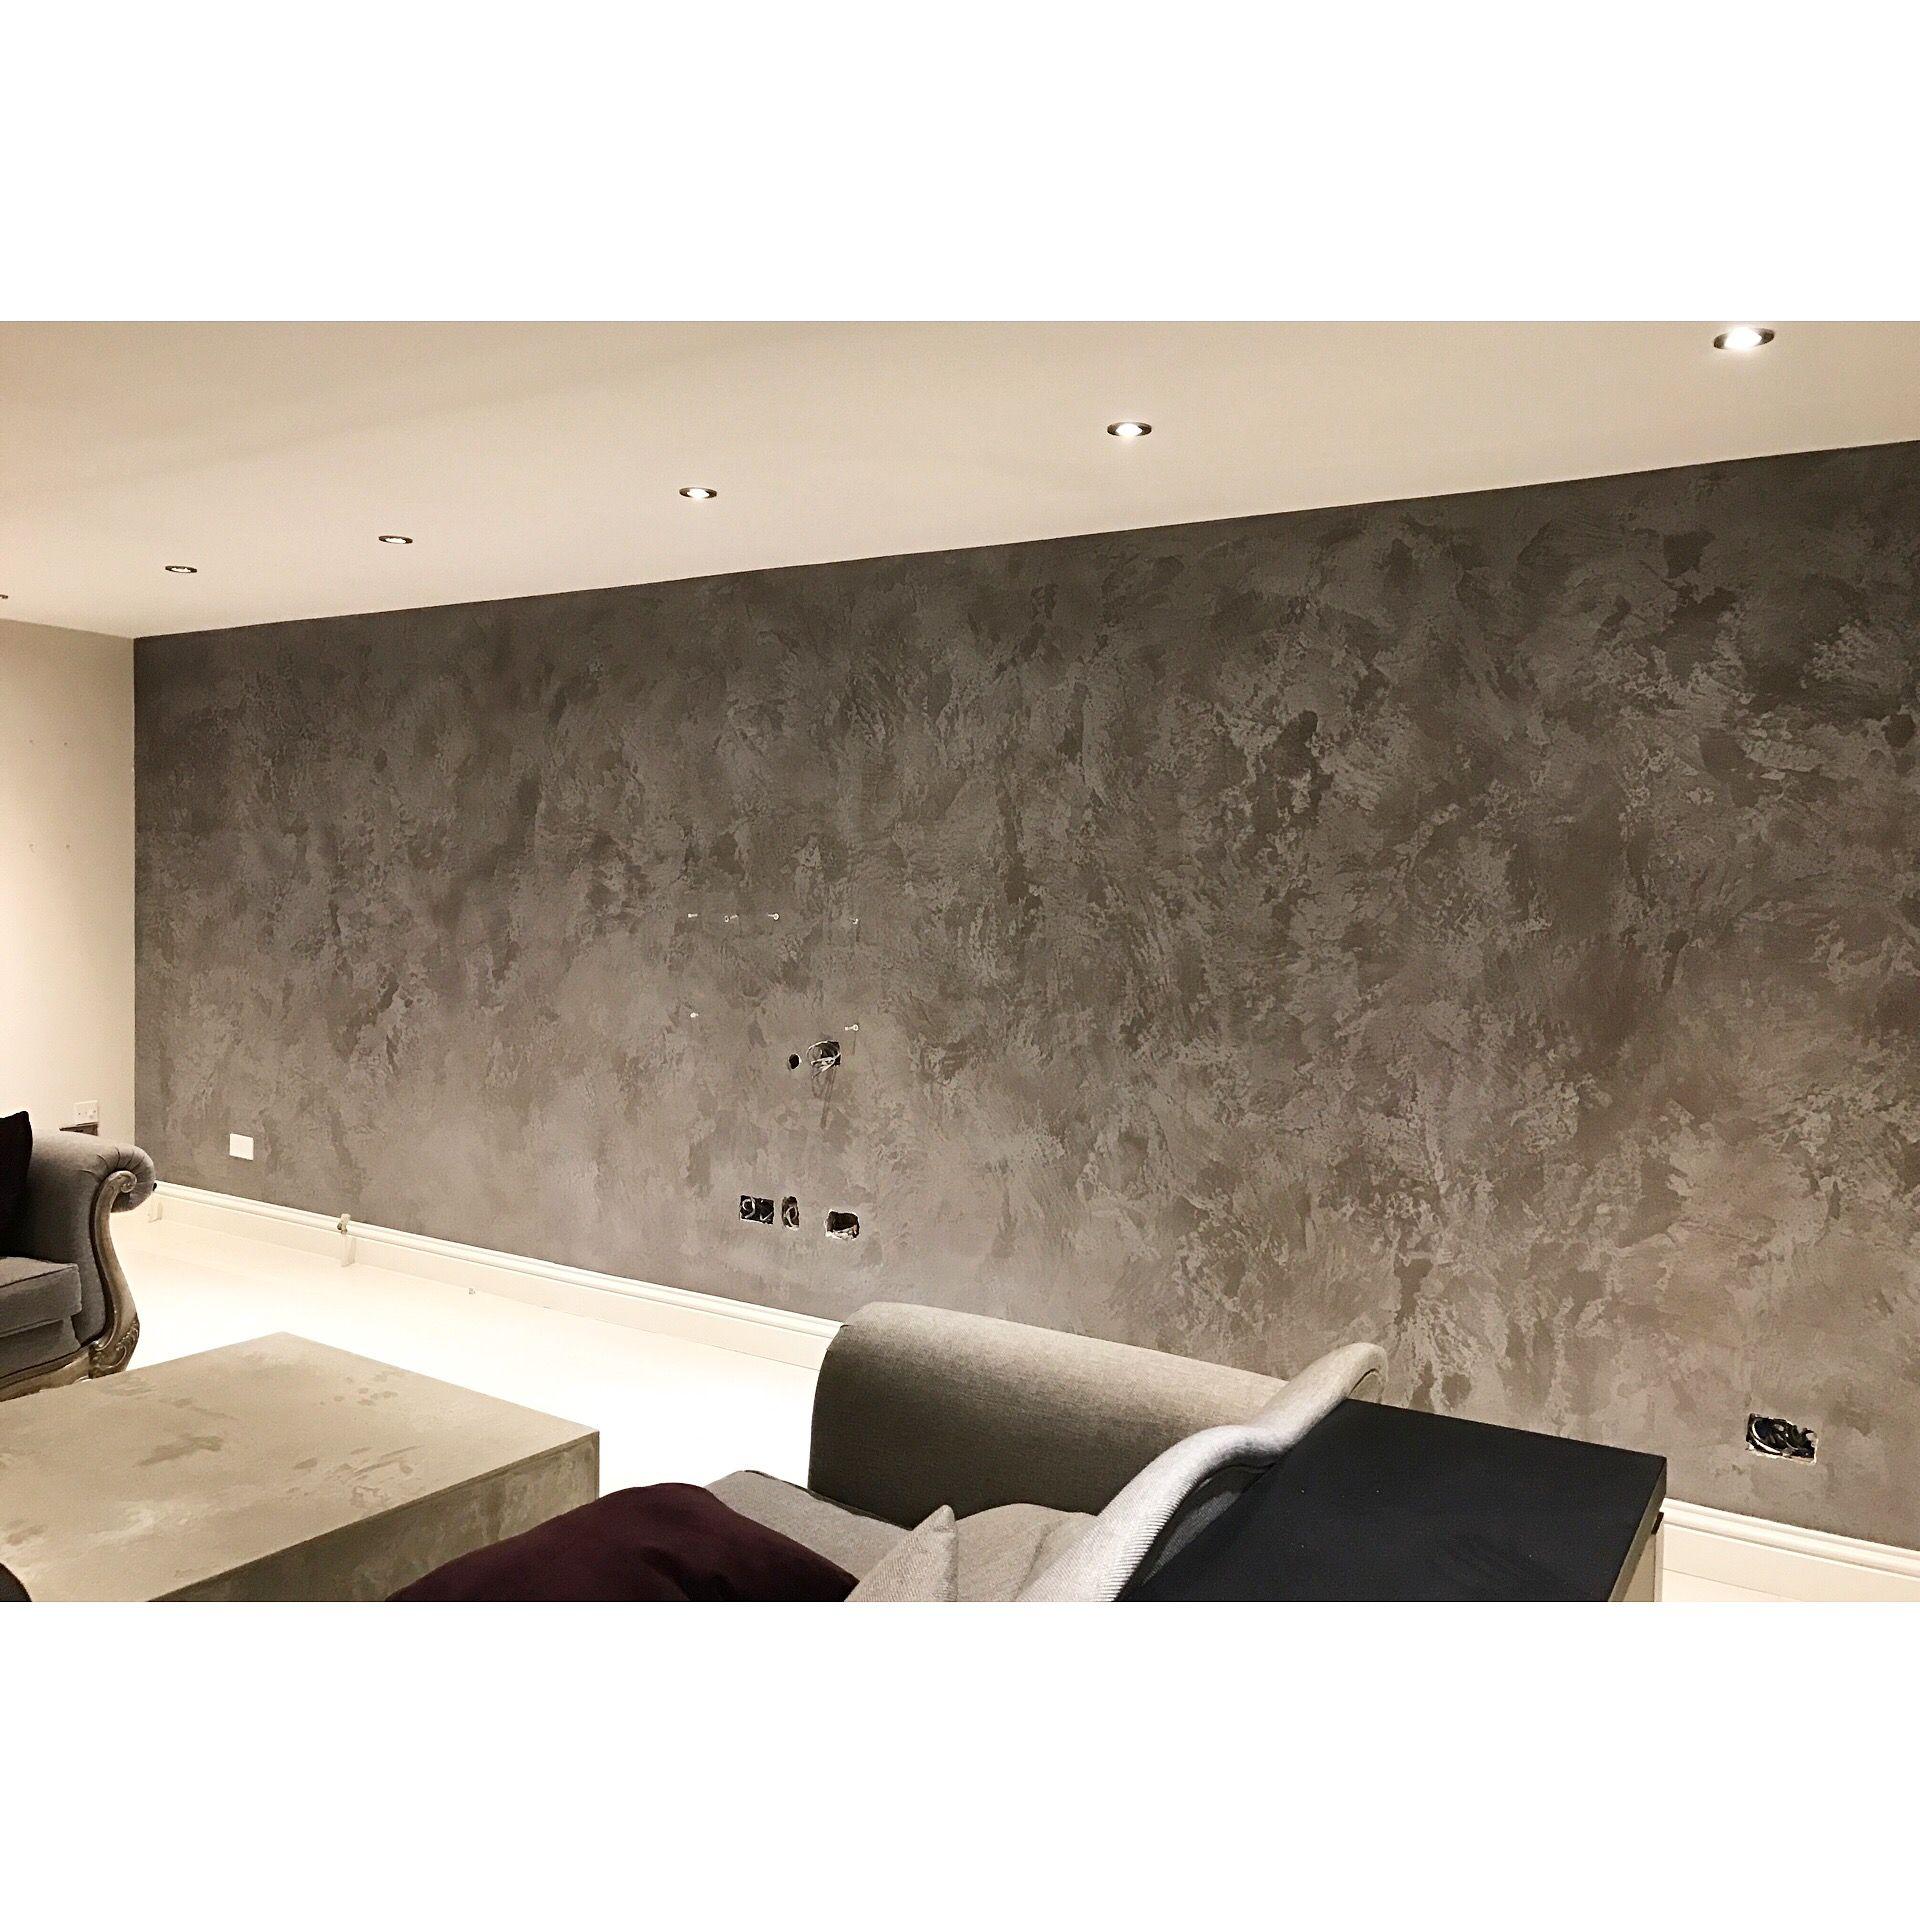 Bespoke Textured Polished Plaster Polished Plaster Venetian Plaster Walls Concrete Walls Interior